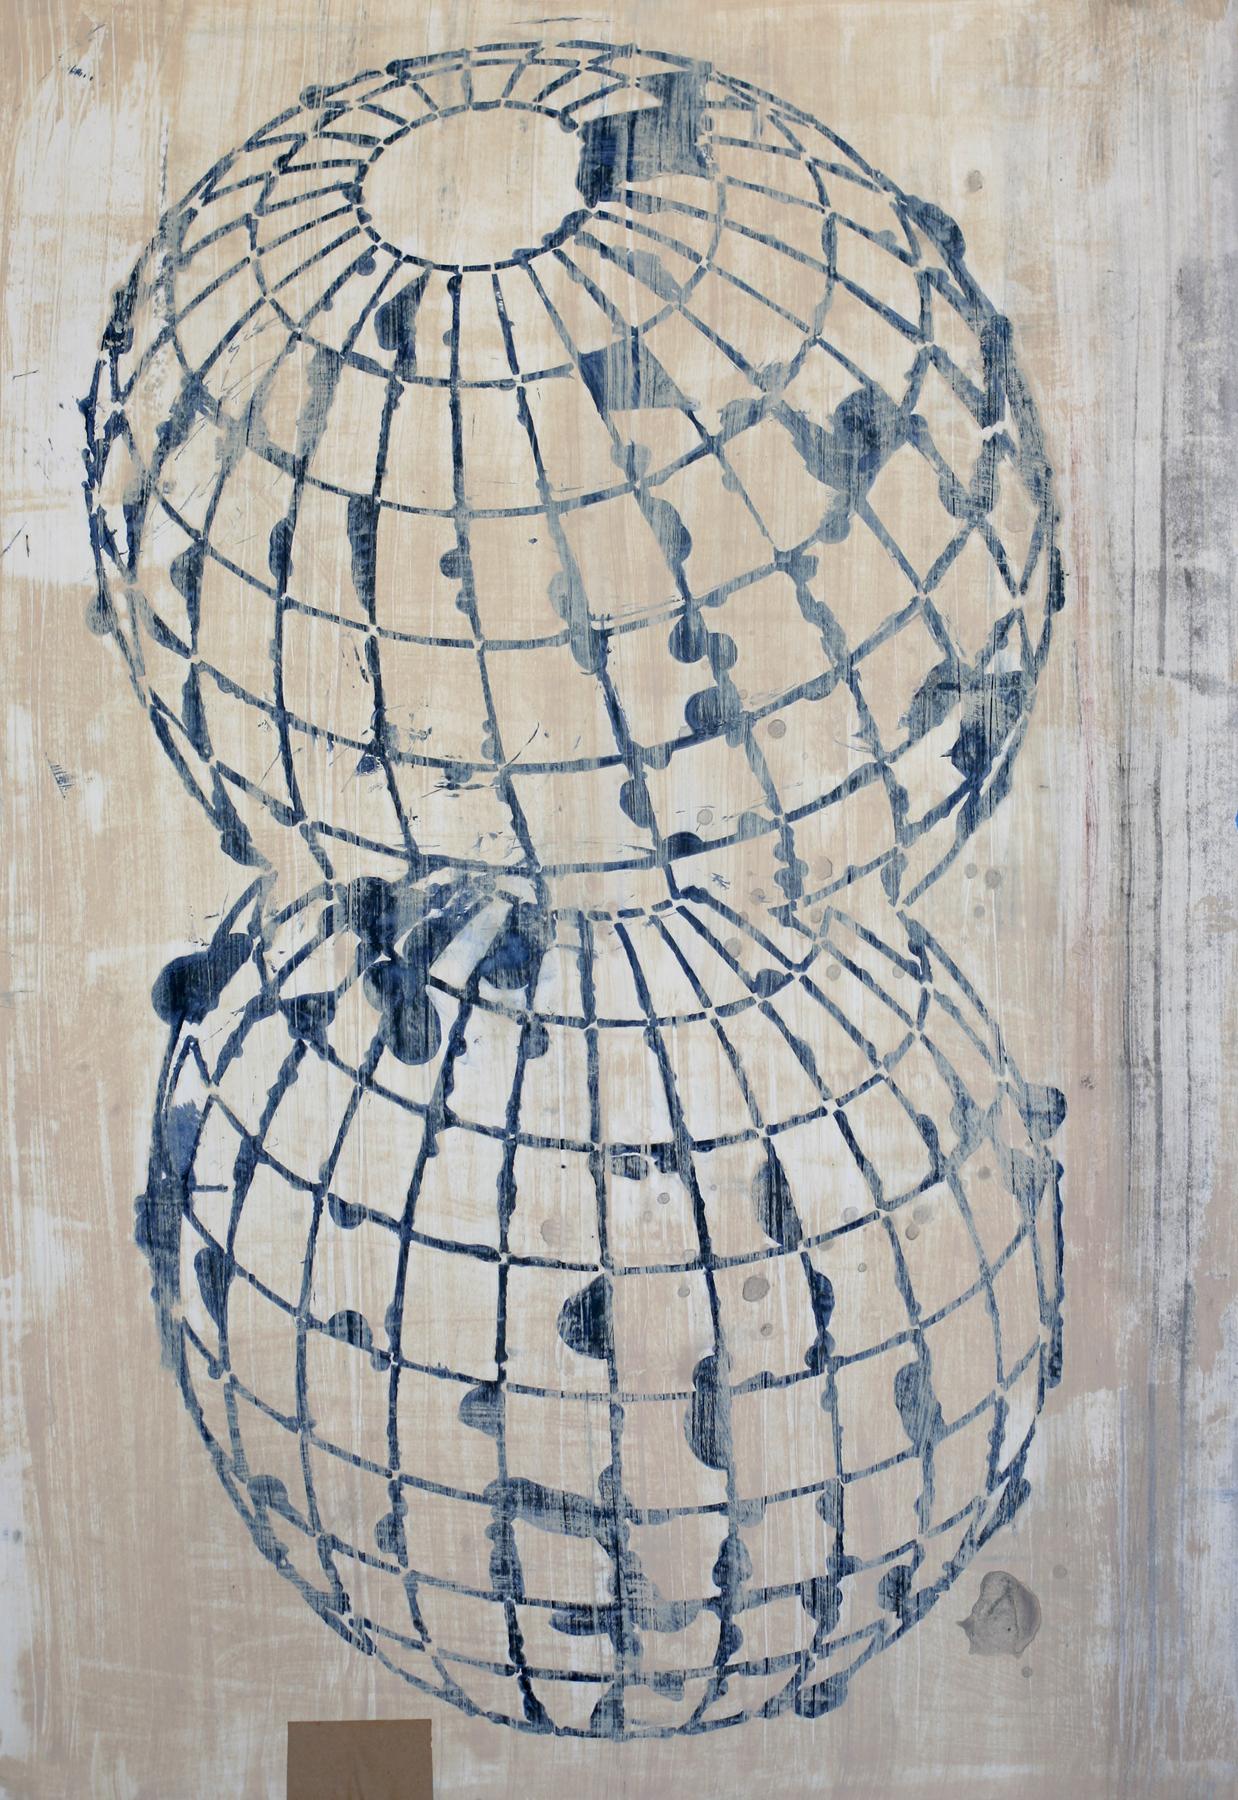 Blue/Black Conjoined Globes